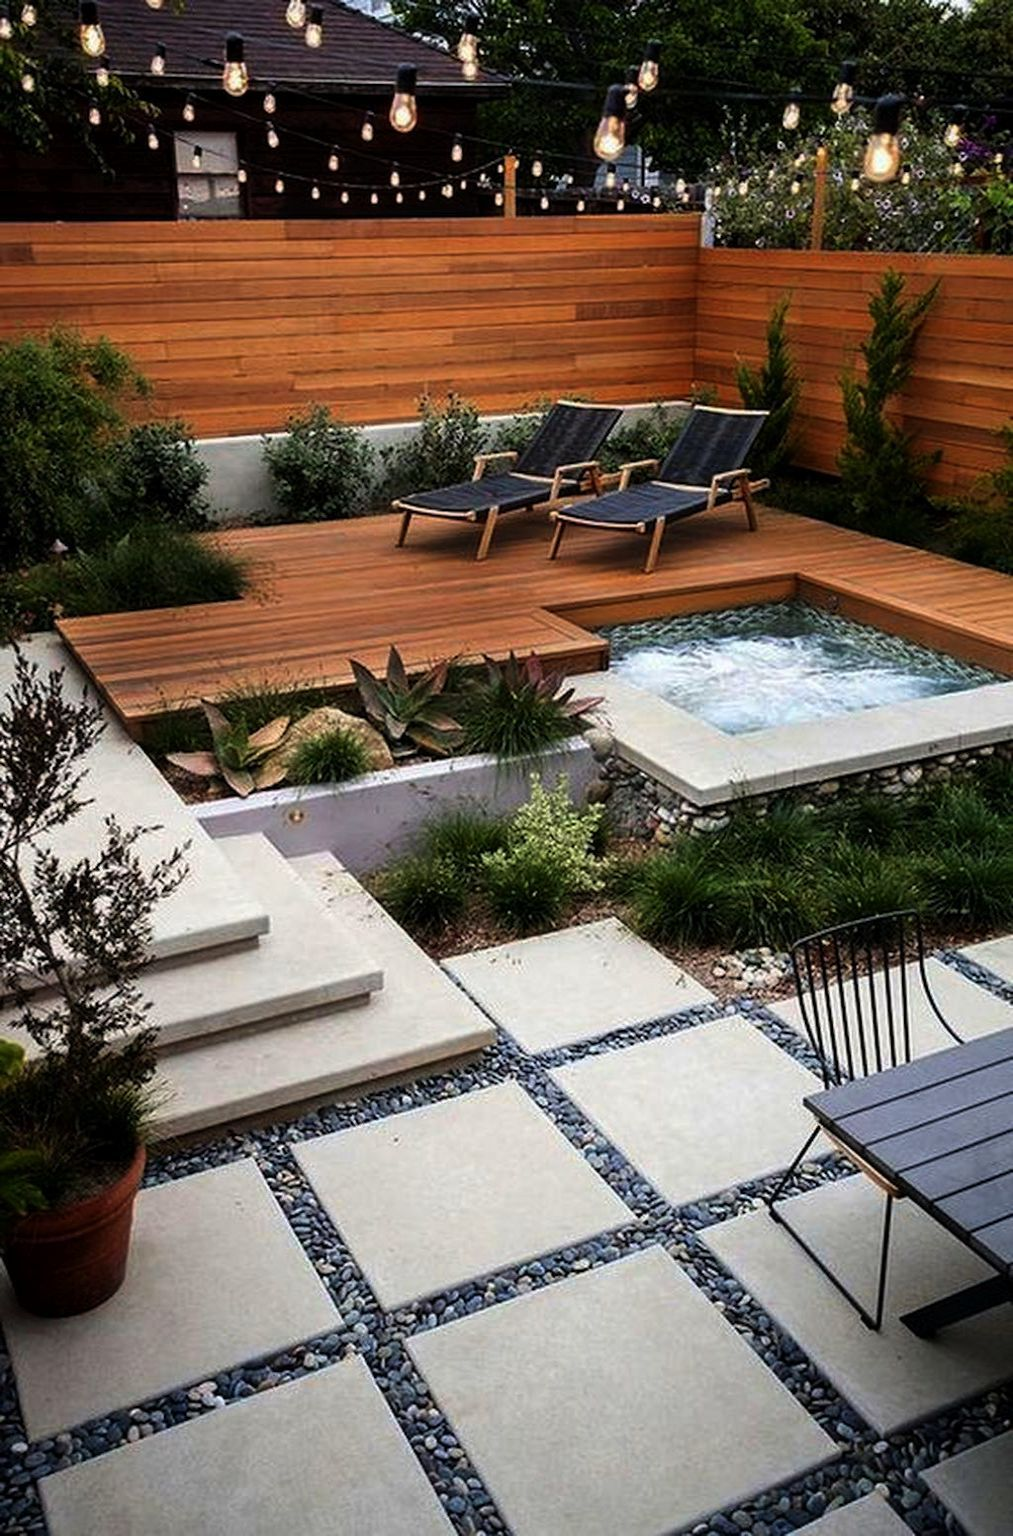 Landscape Gardening Jobs In Canada Modern Landscape Design Backyard Beside Landscape Gardening Ideas Modern Landscape Design Modern Landscaping Backyard House